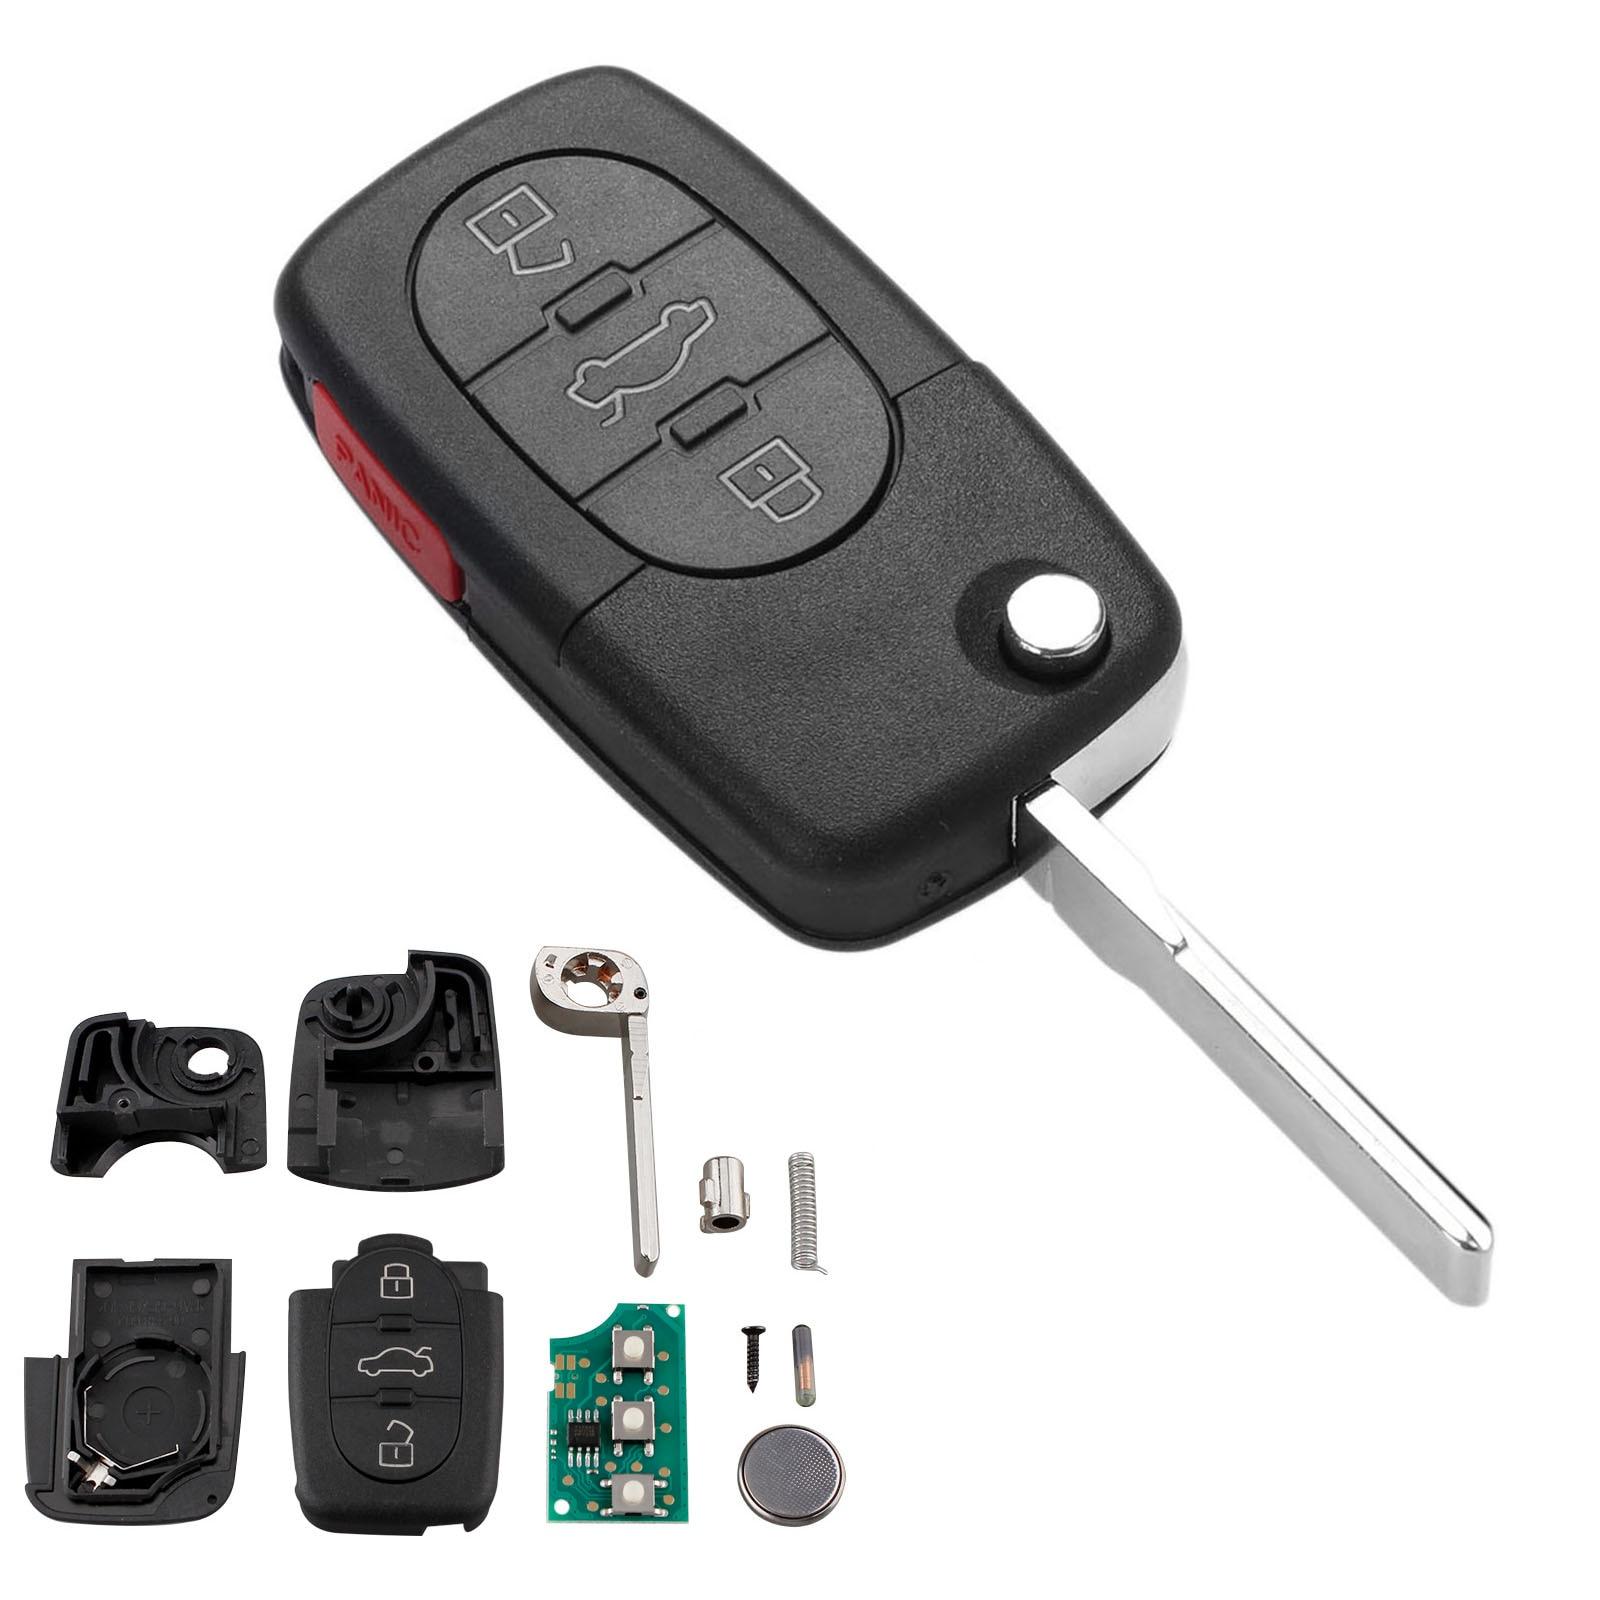 3+1 Button 315MHz Car Remote Key 4D0837231E For Audi A4 A6 A8 Quattro S4 TT 2000 2001 2002 2003 2004 2005 ID48 Chip